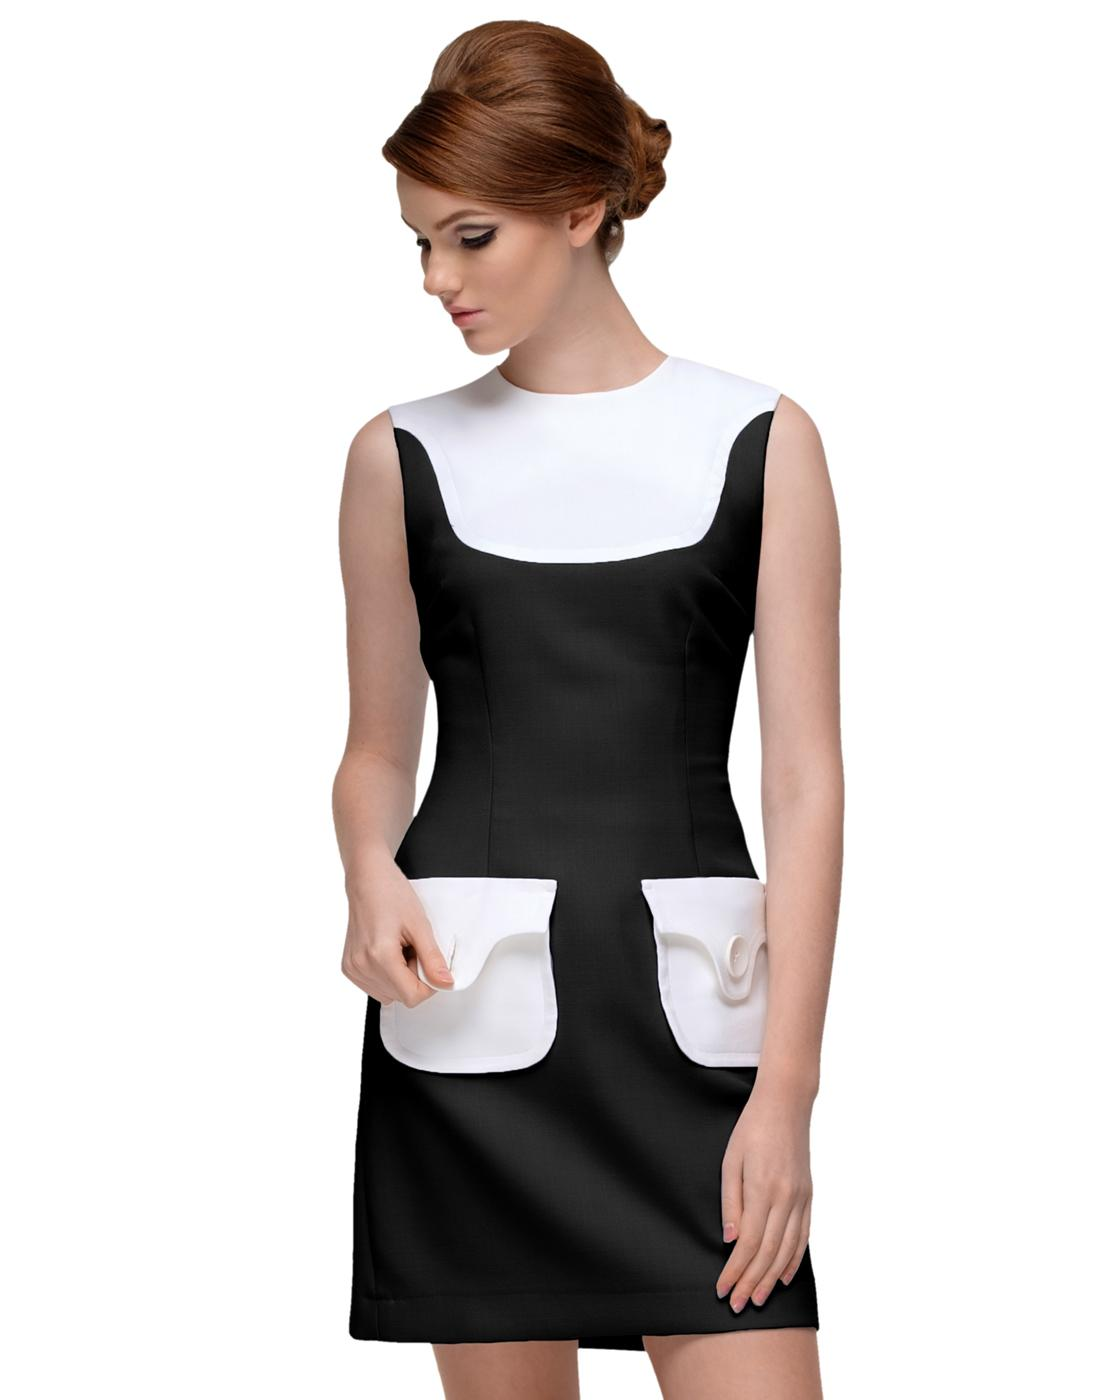 MARMALADE Retro 60s Mod Mini Dress (Black/Cream)